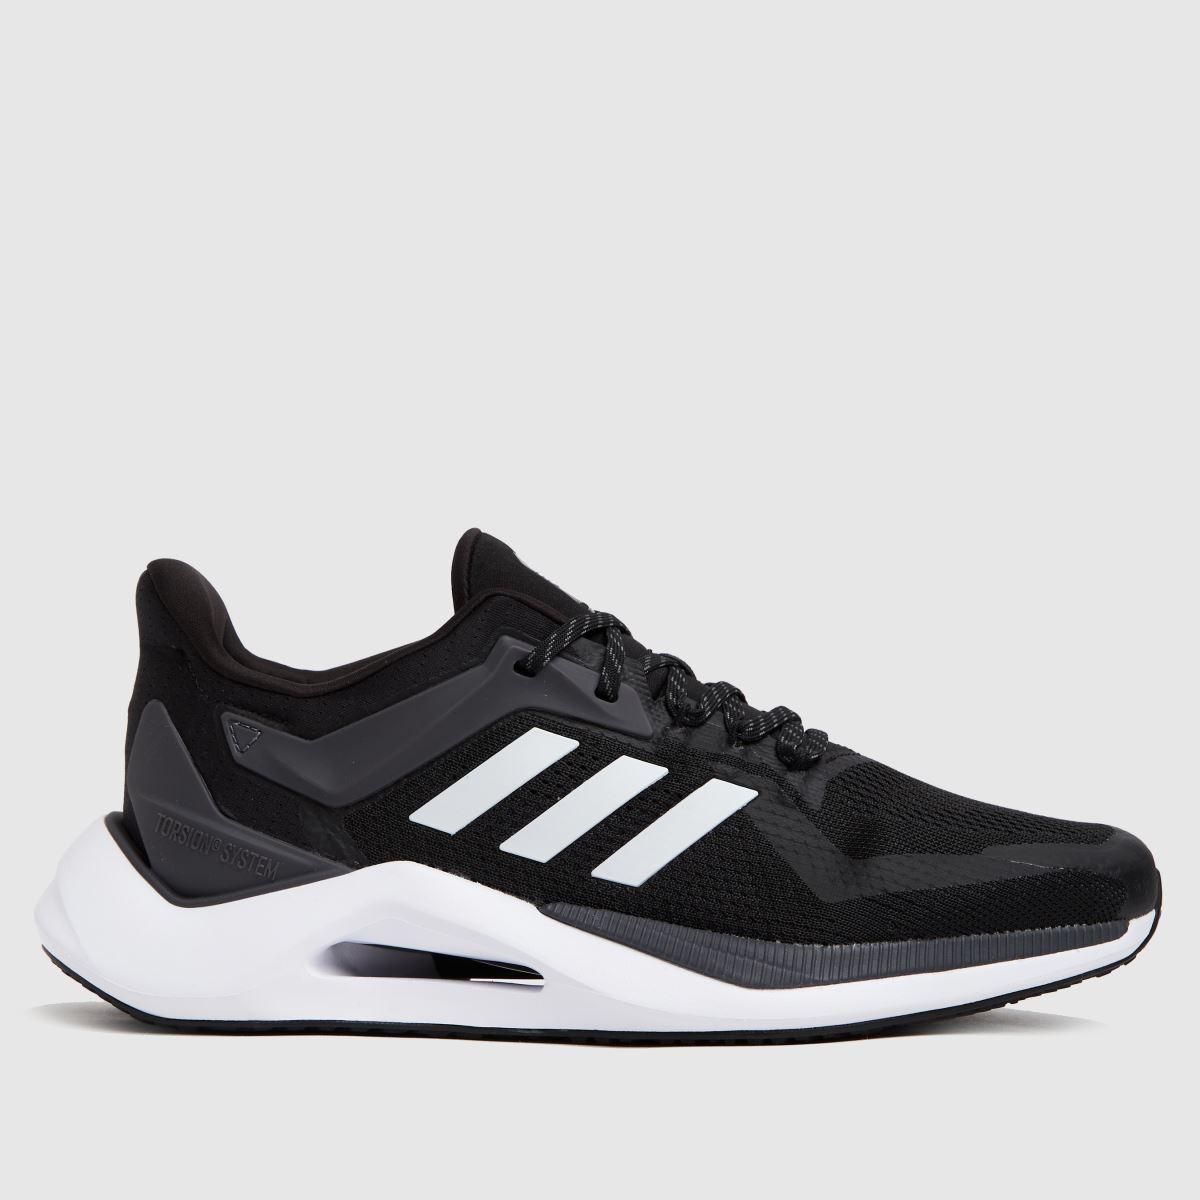 Adidas Black & White Alphatorsion 2.0 Trainers